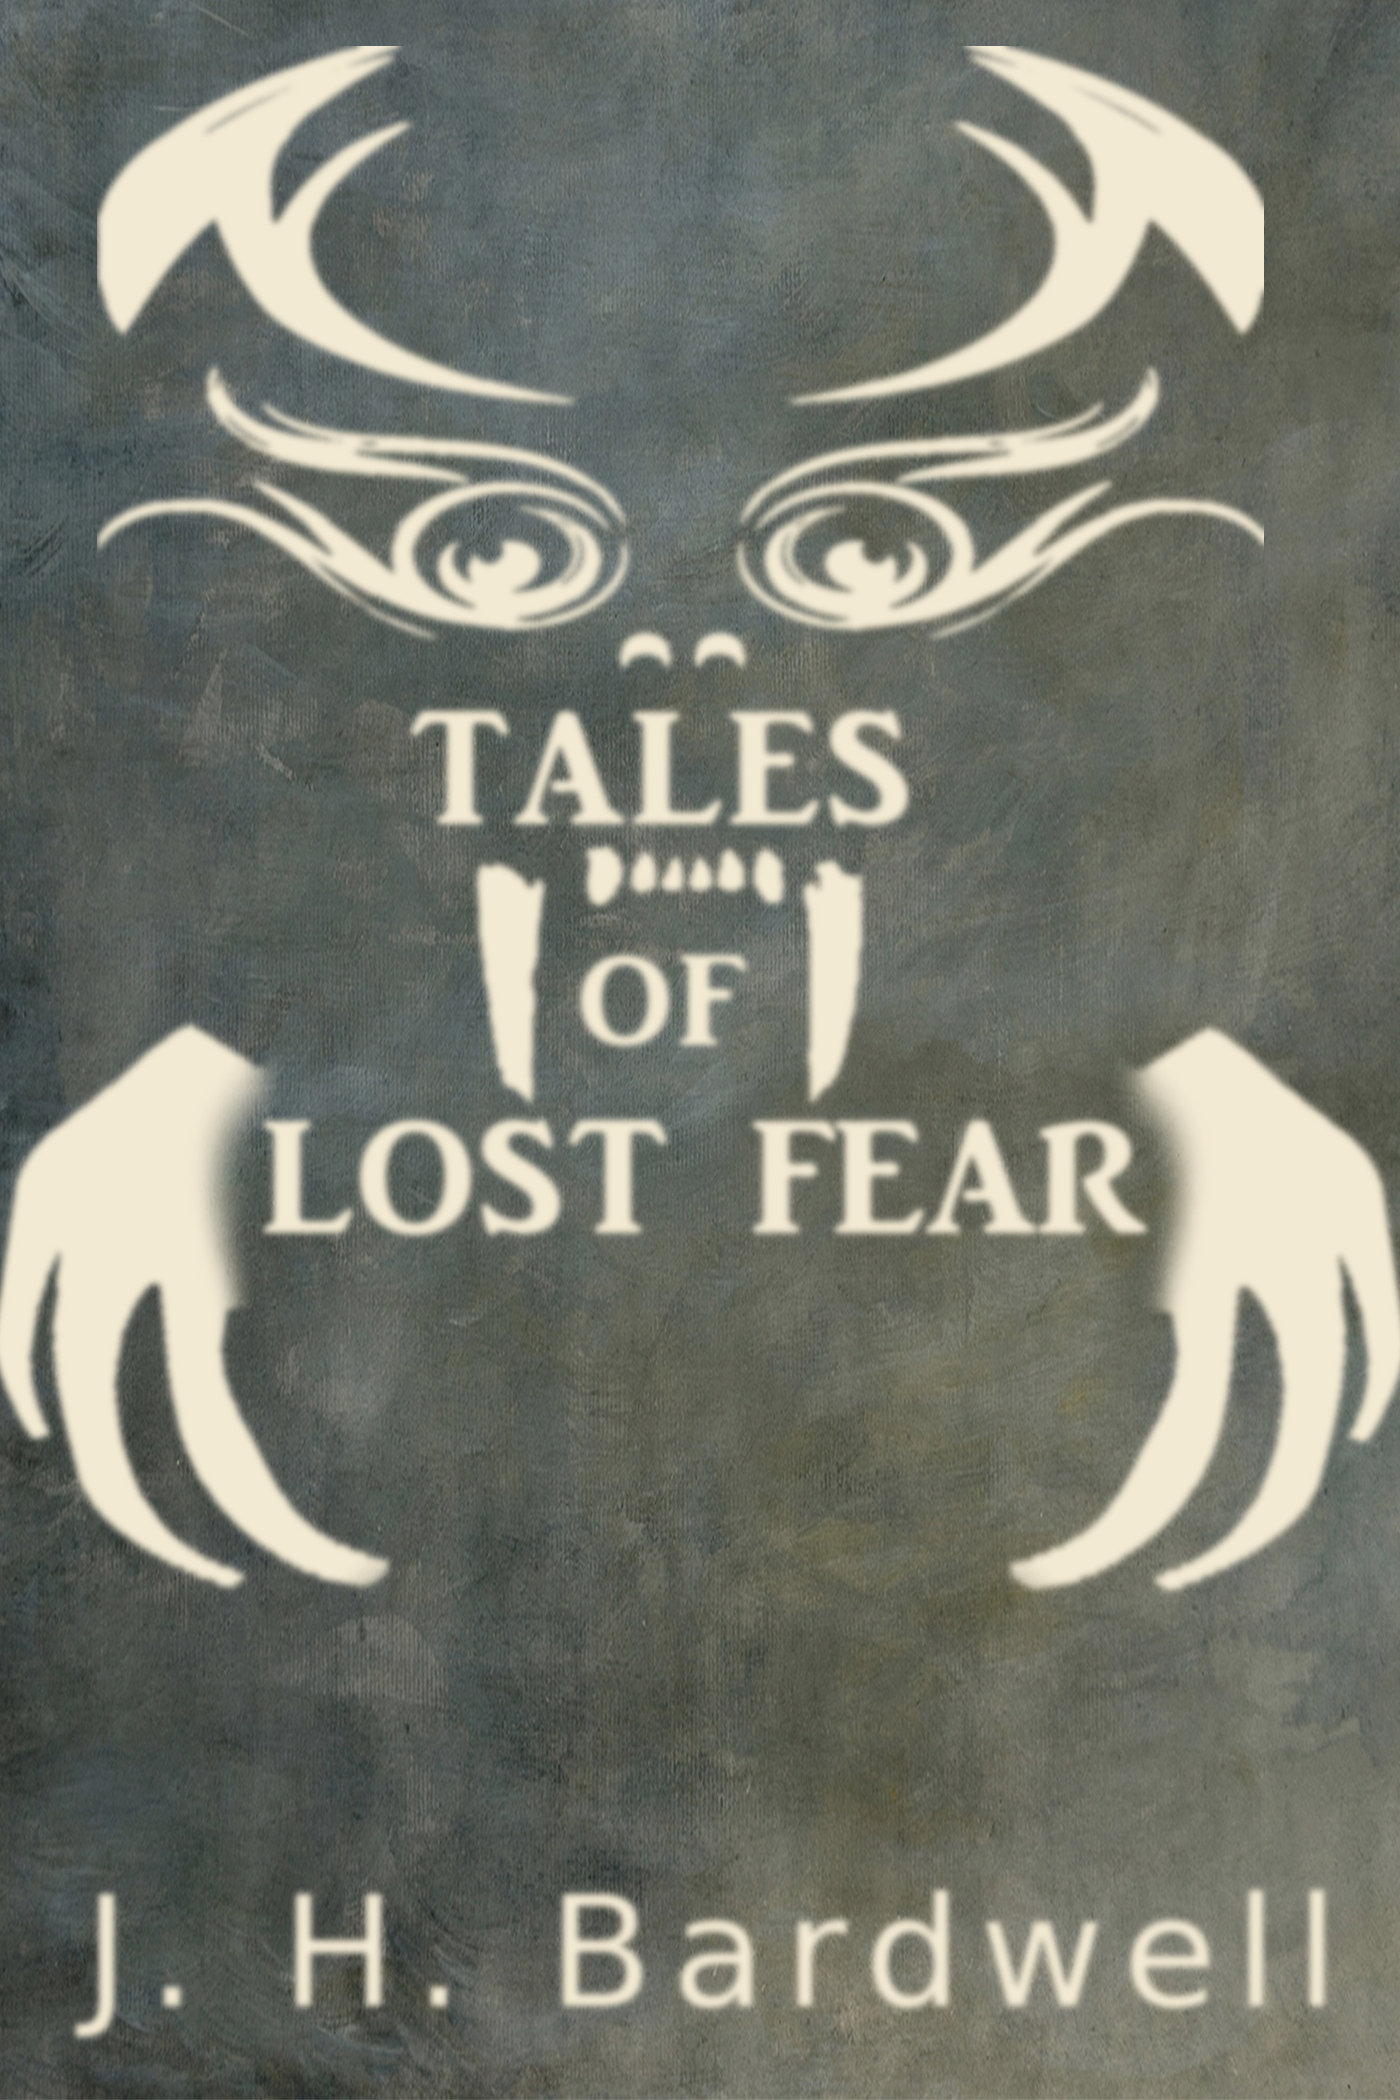 Tales of lost fear